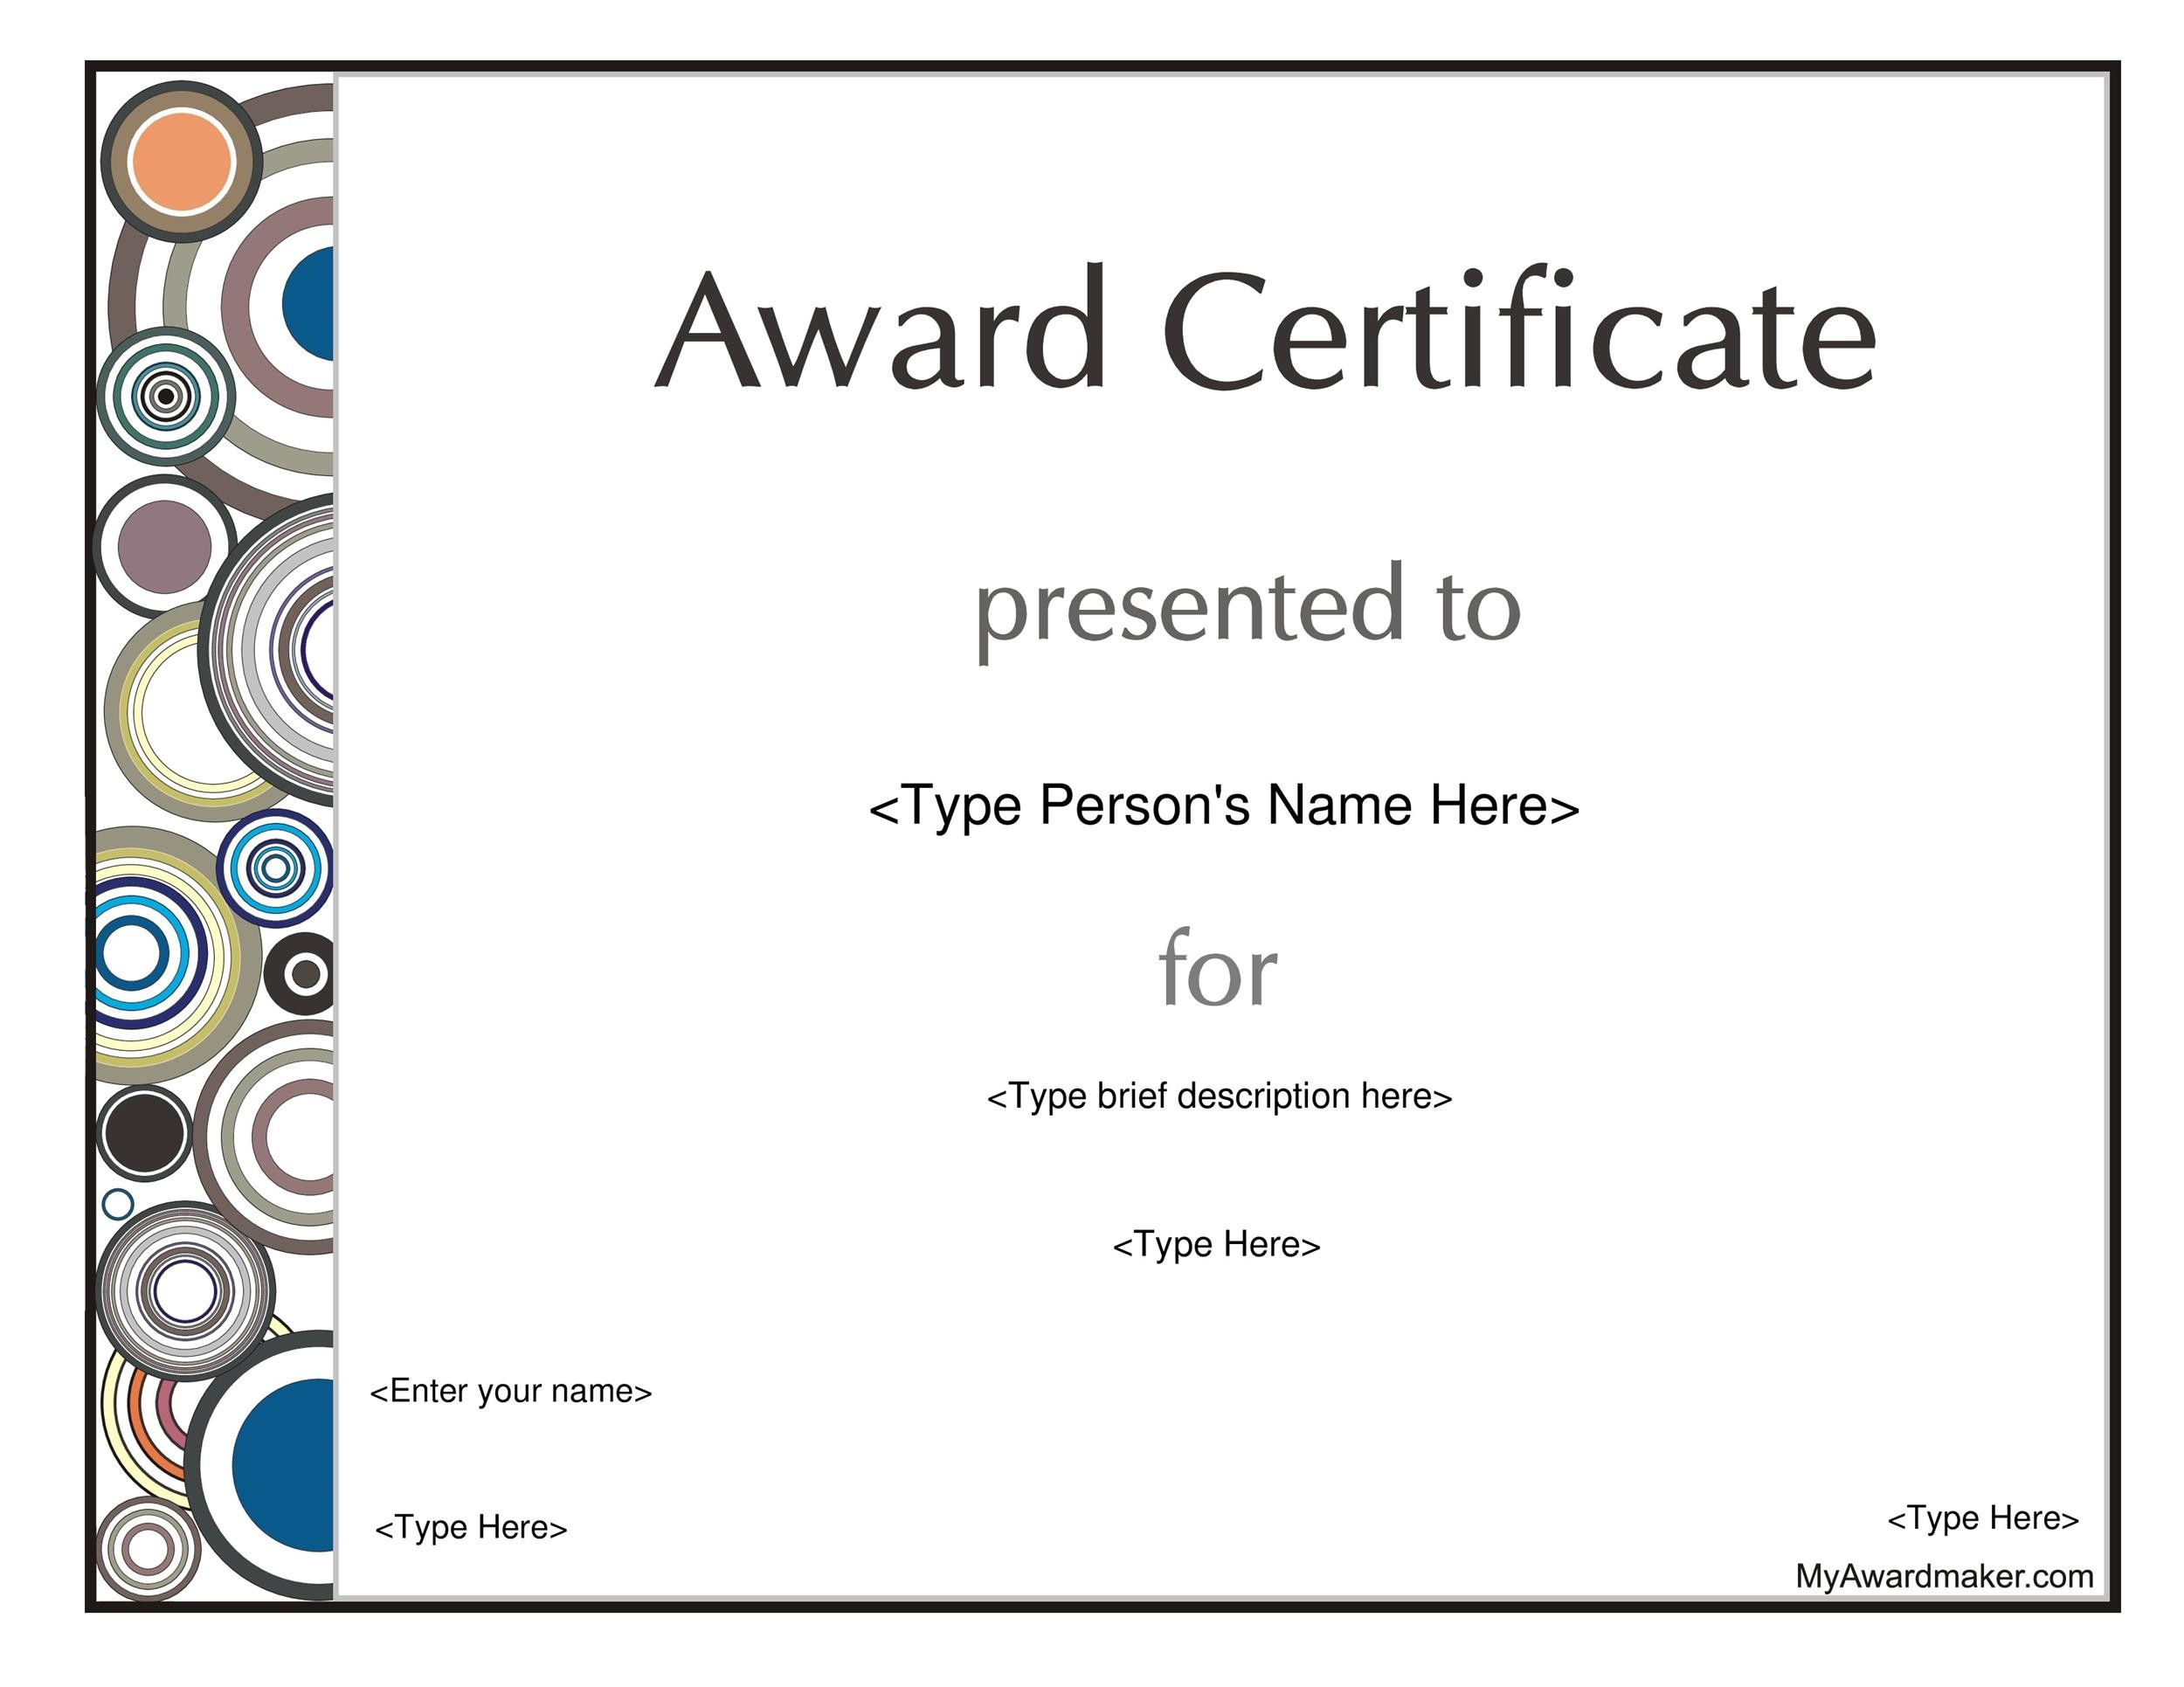 50 Amazing Award Certificate Templates ᐅ Template Lab